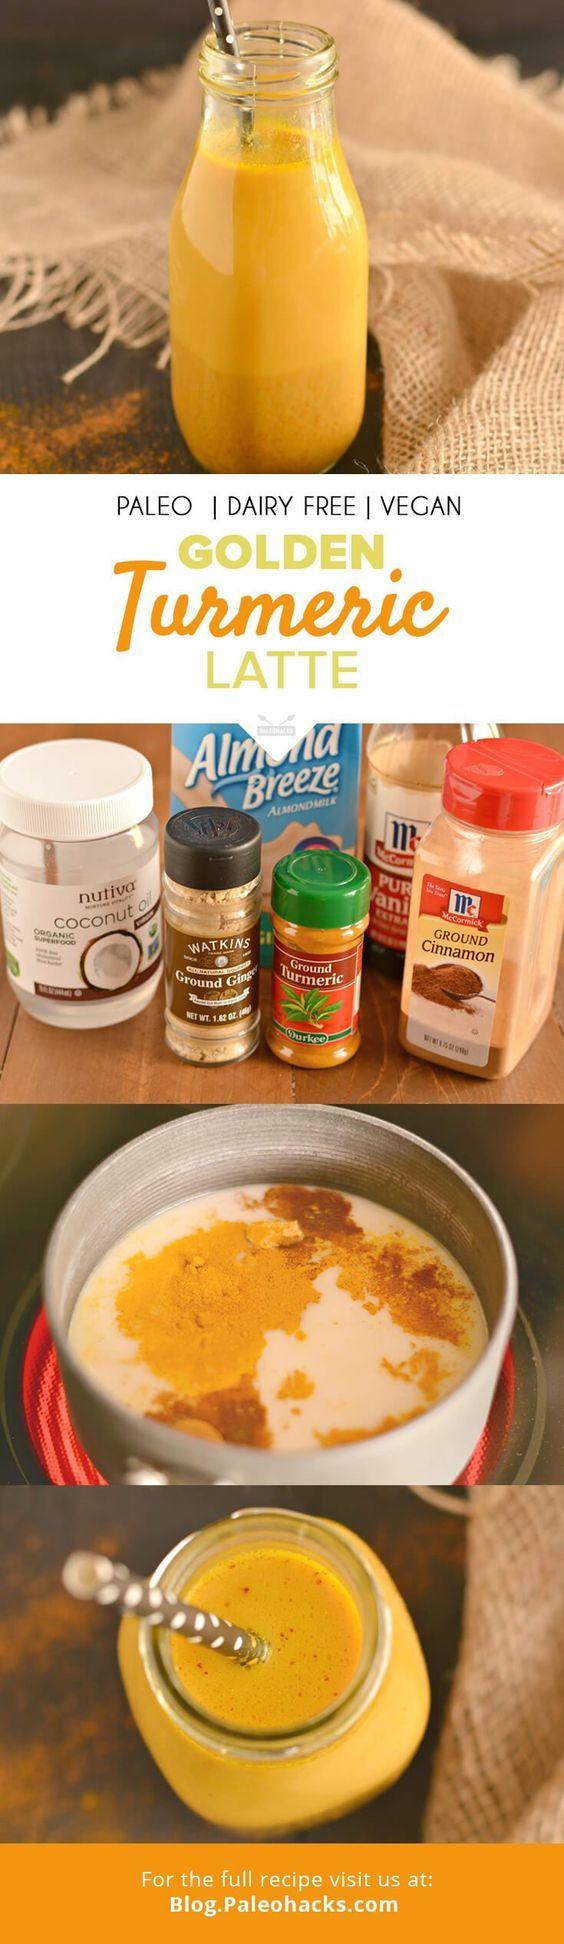 Golden Turmeric Latte  #justeatrealfood #paleohacks